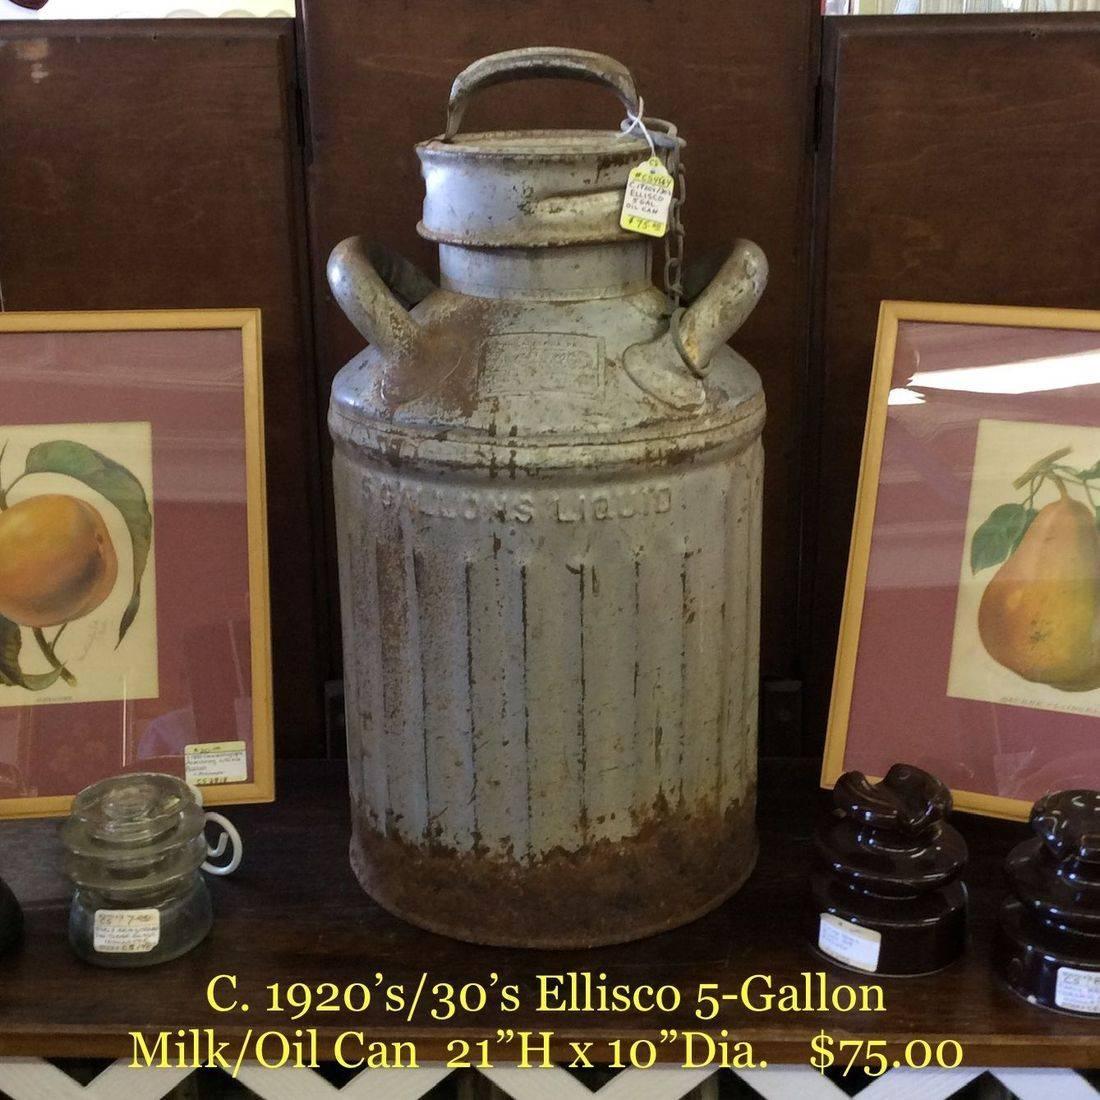 C. 1920's/30's Ellisco  5-Gallon Milk/Oil Can   $75.00